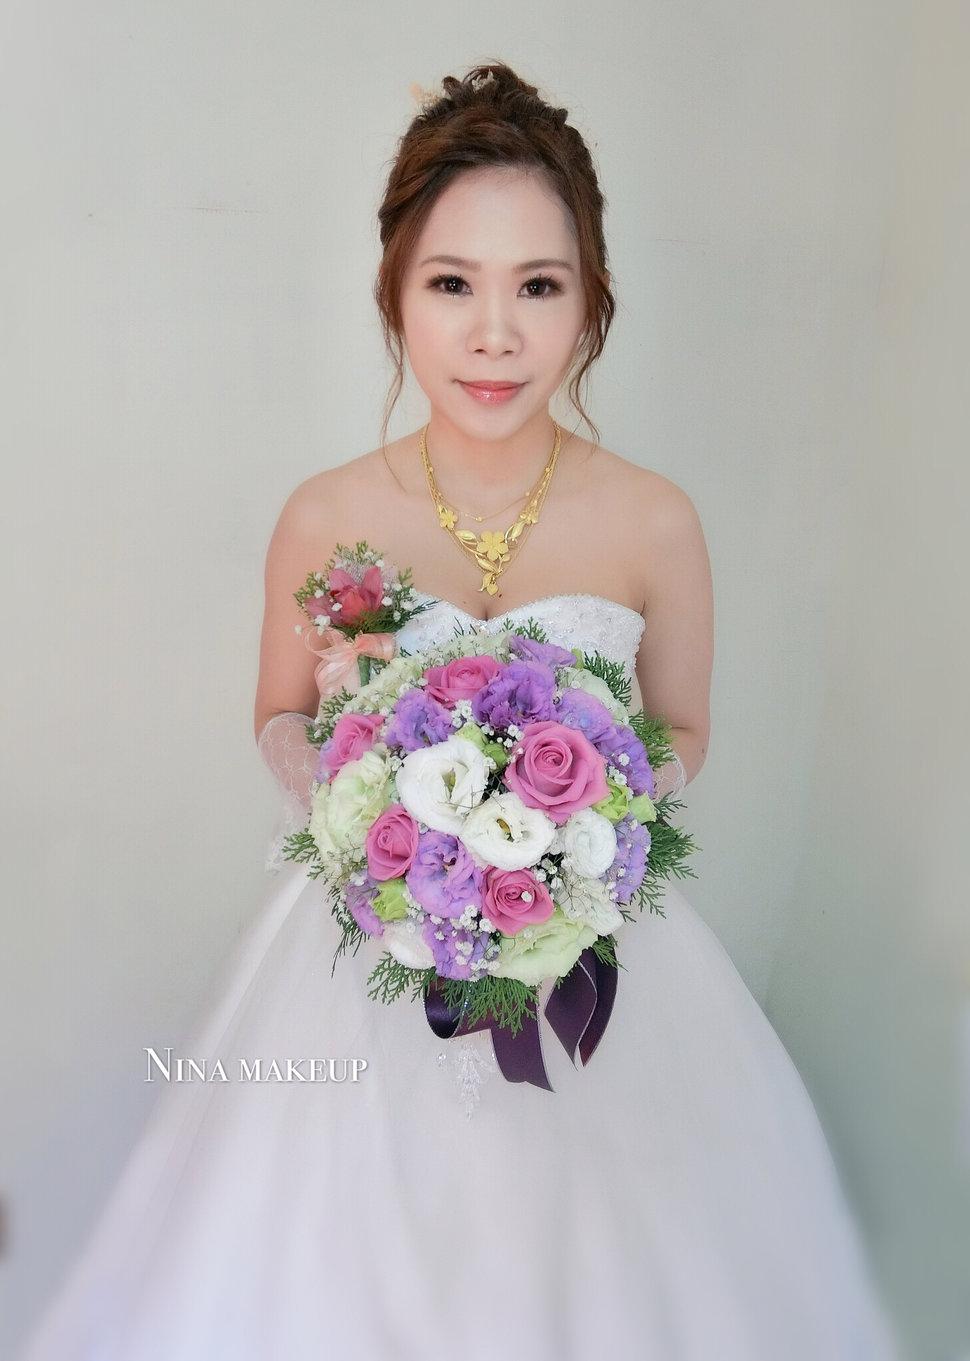 FE8EBFC0-06B8-4BF5-8B9D-082E50E536D4 - 何品億新娘秘書 - 結婚吧